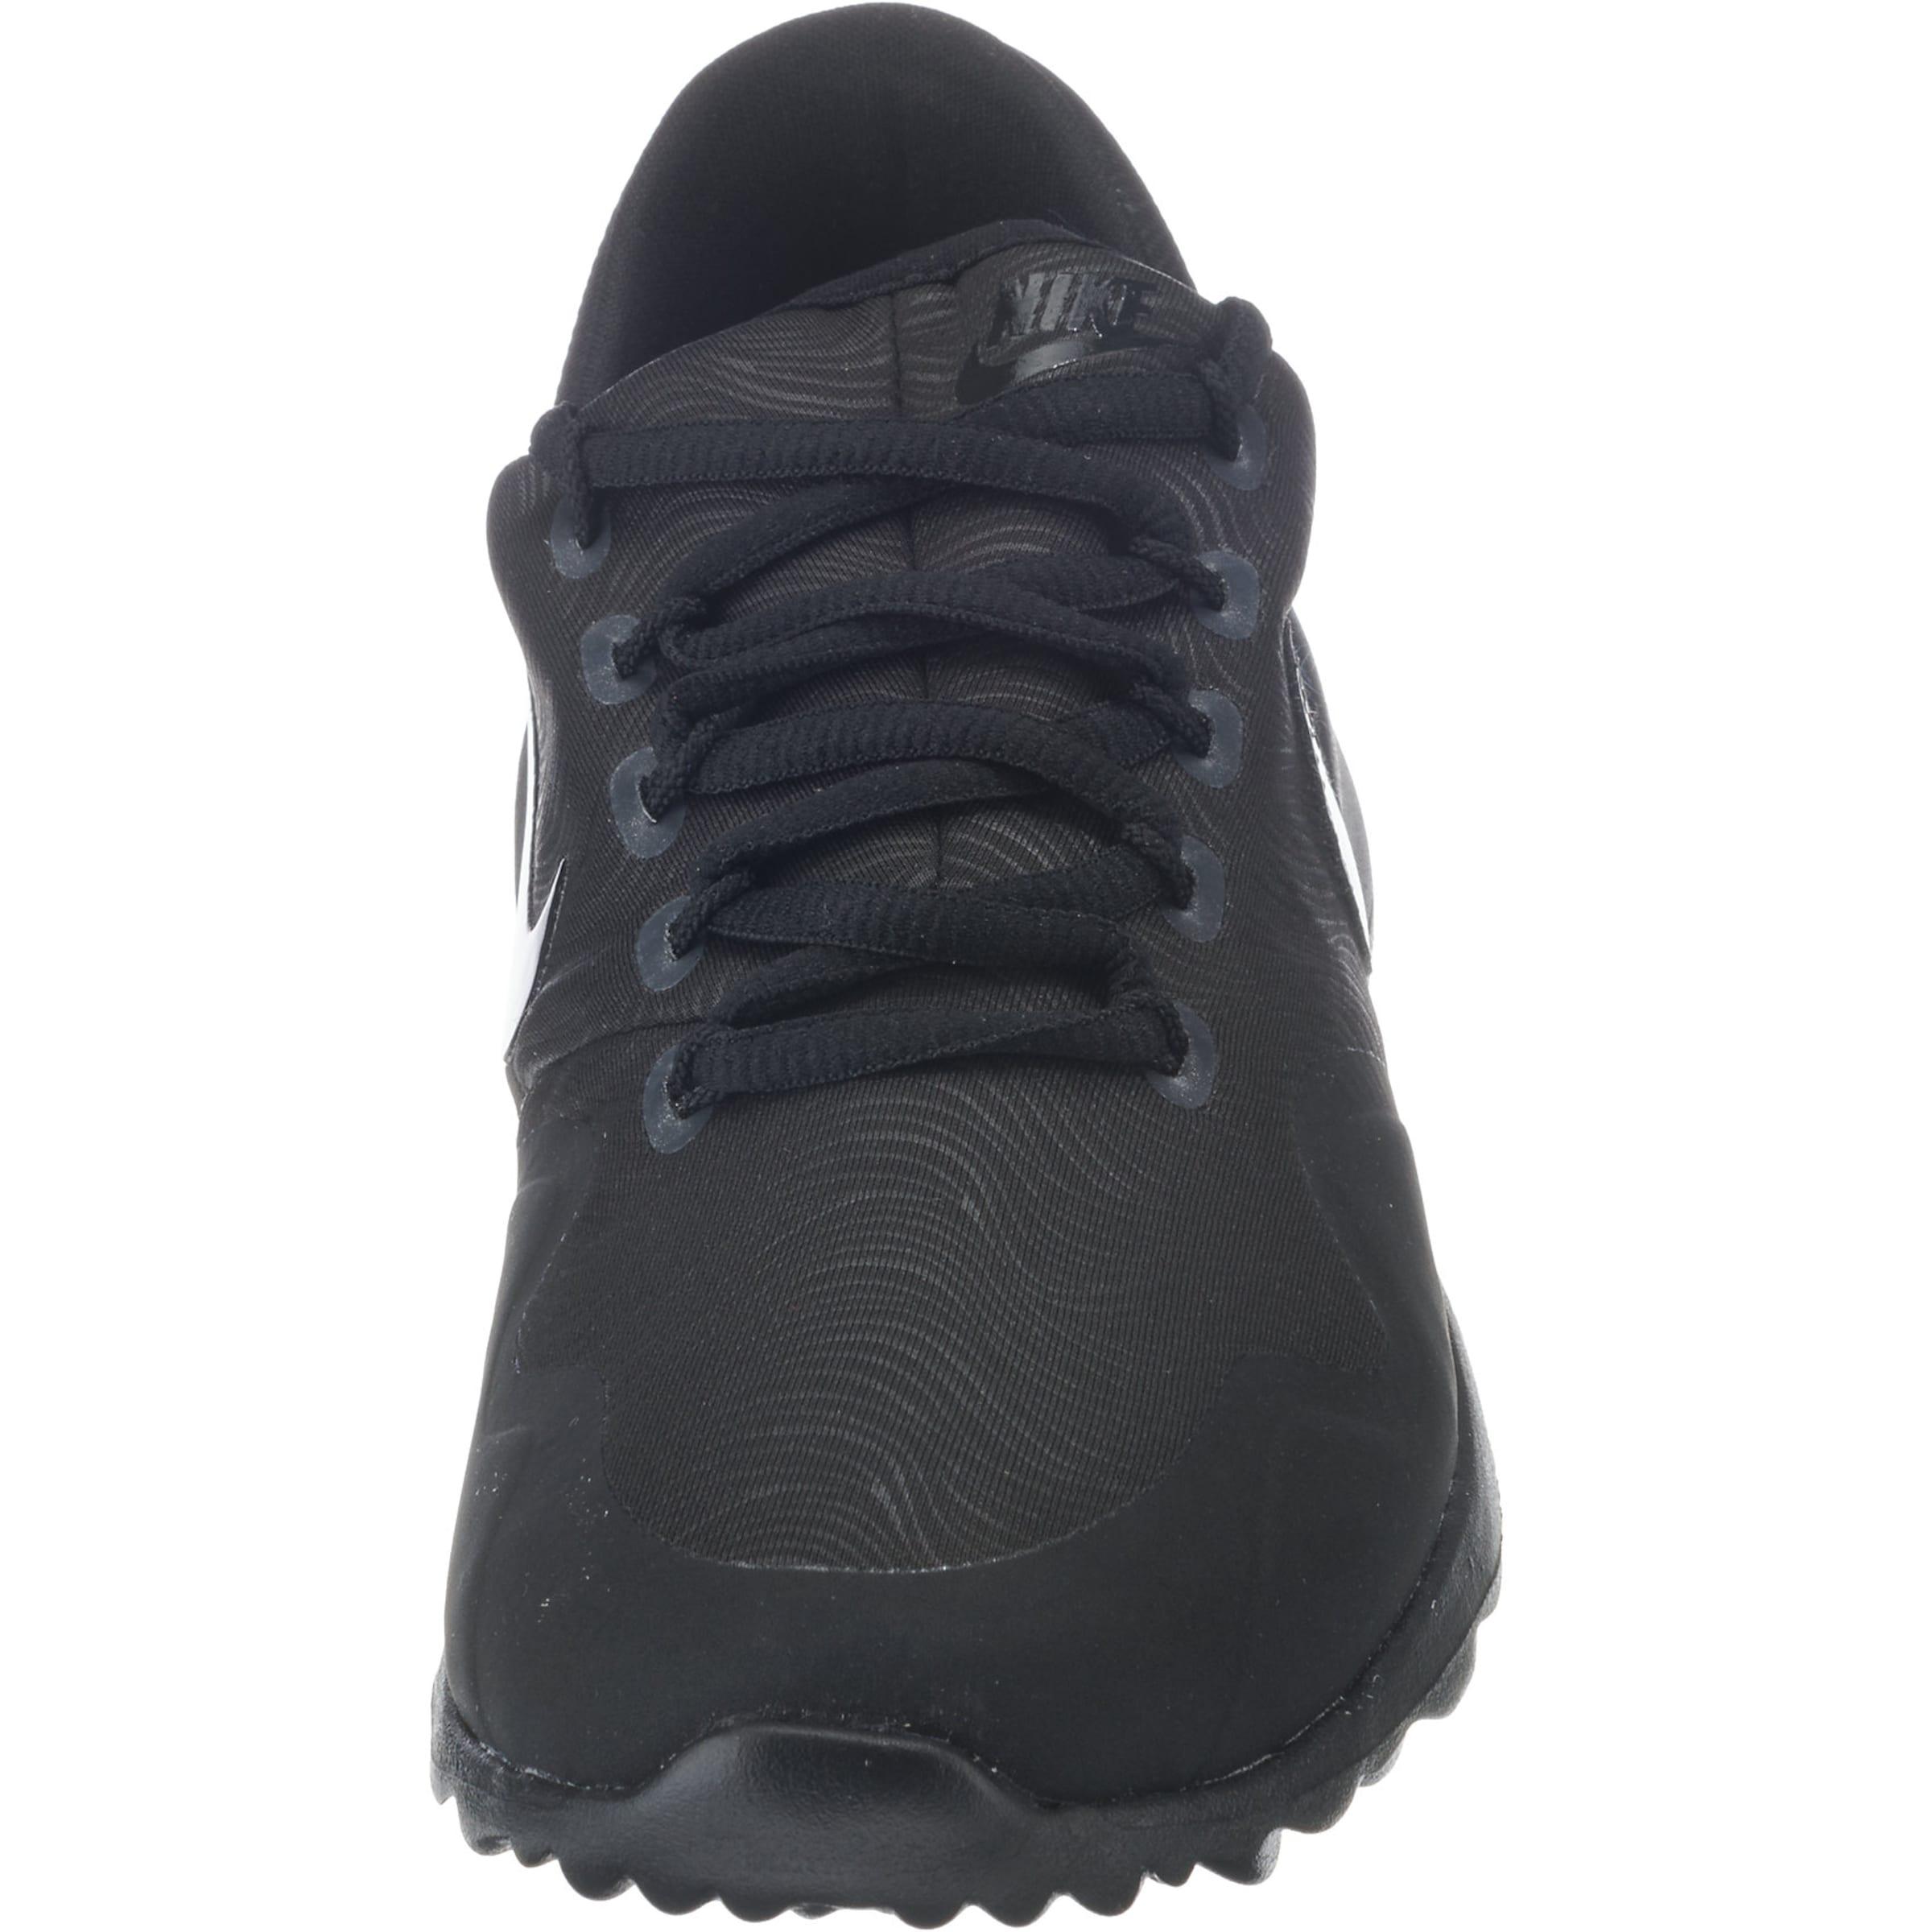 Nike Sportswear Turnschuhe 'Air Max Sasha Textil Bequem, gut aussehend aussehend aussehend 2a0b6d